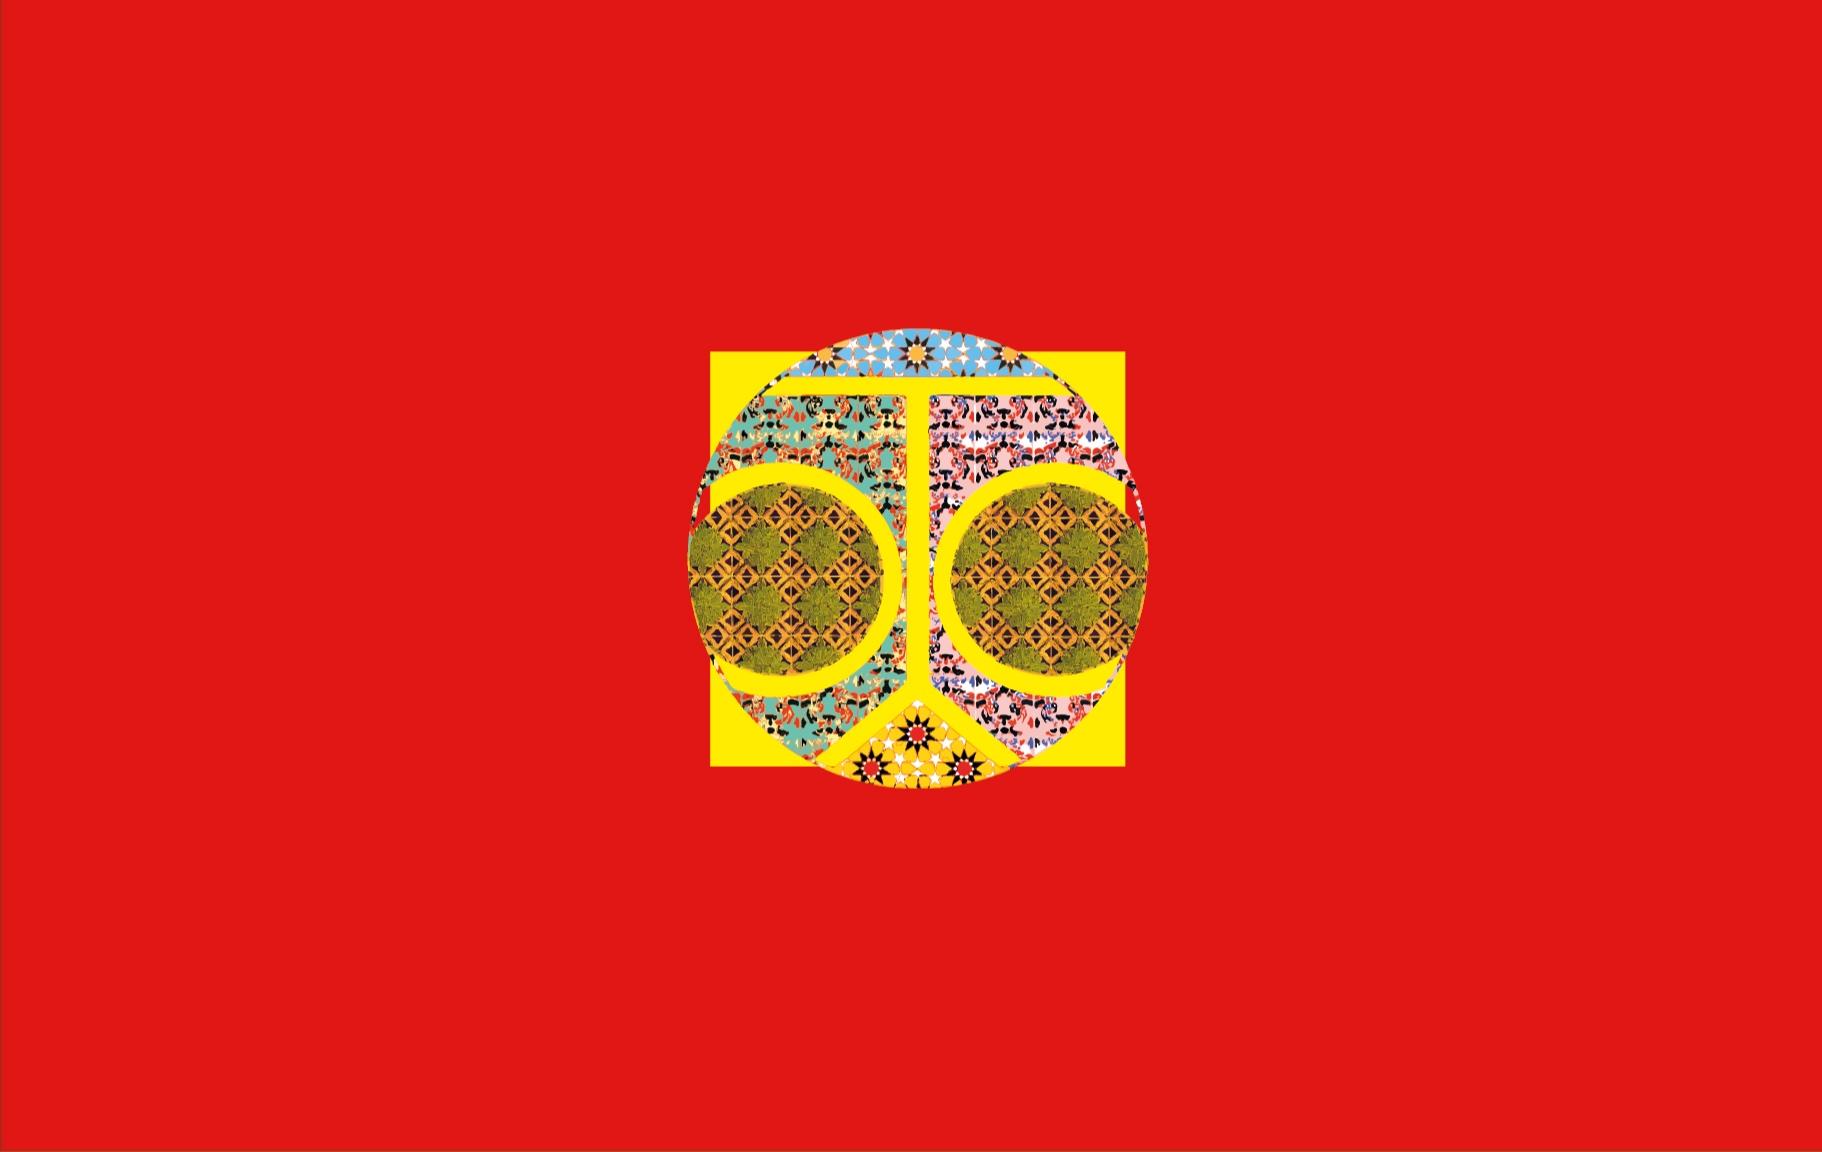 Asset+19+logo+yellow+square+on+red.jpg